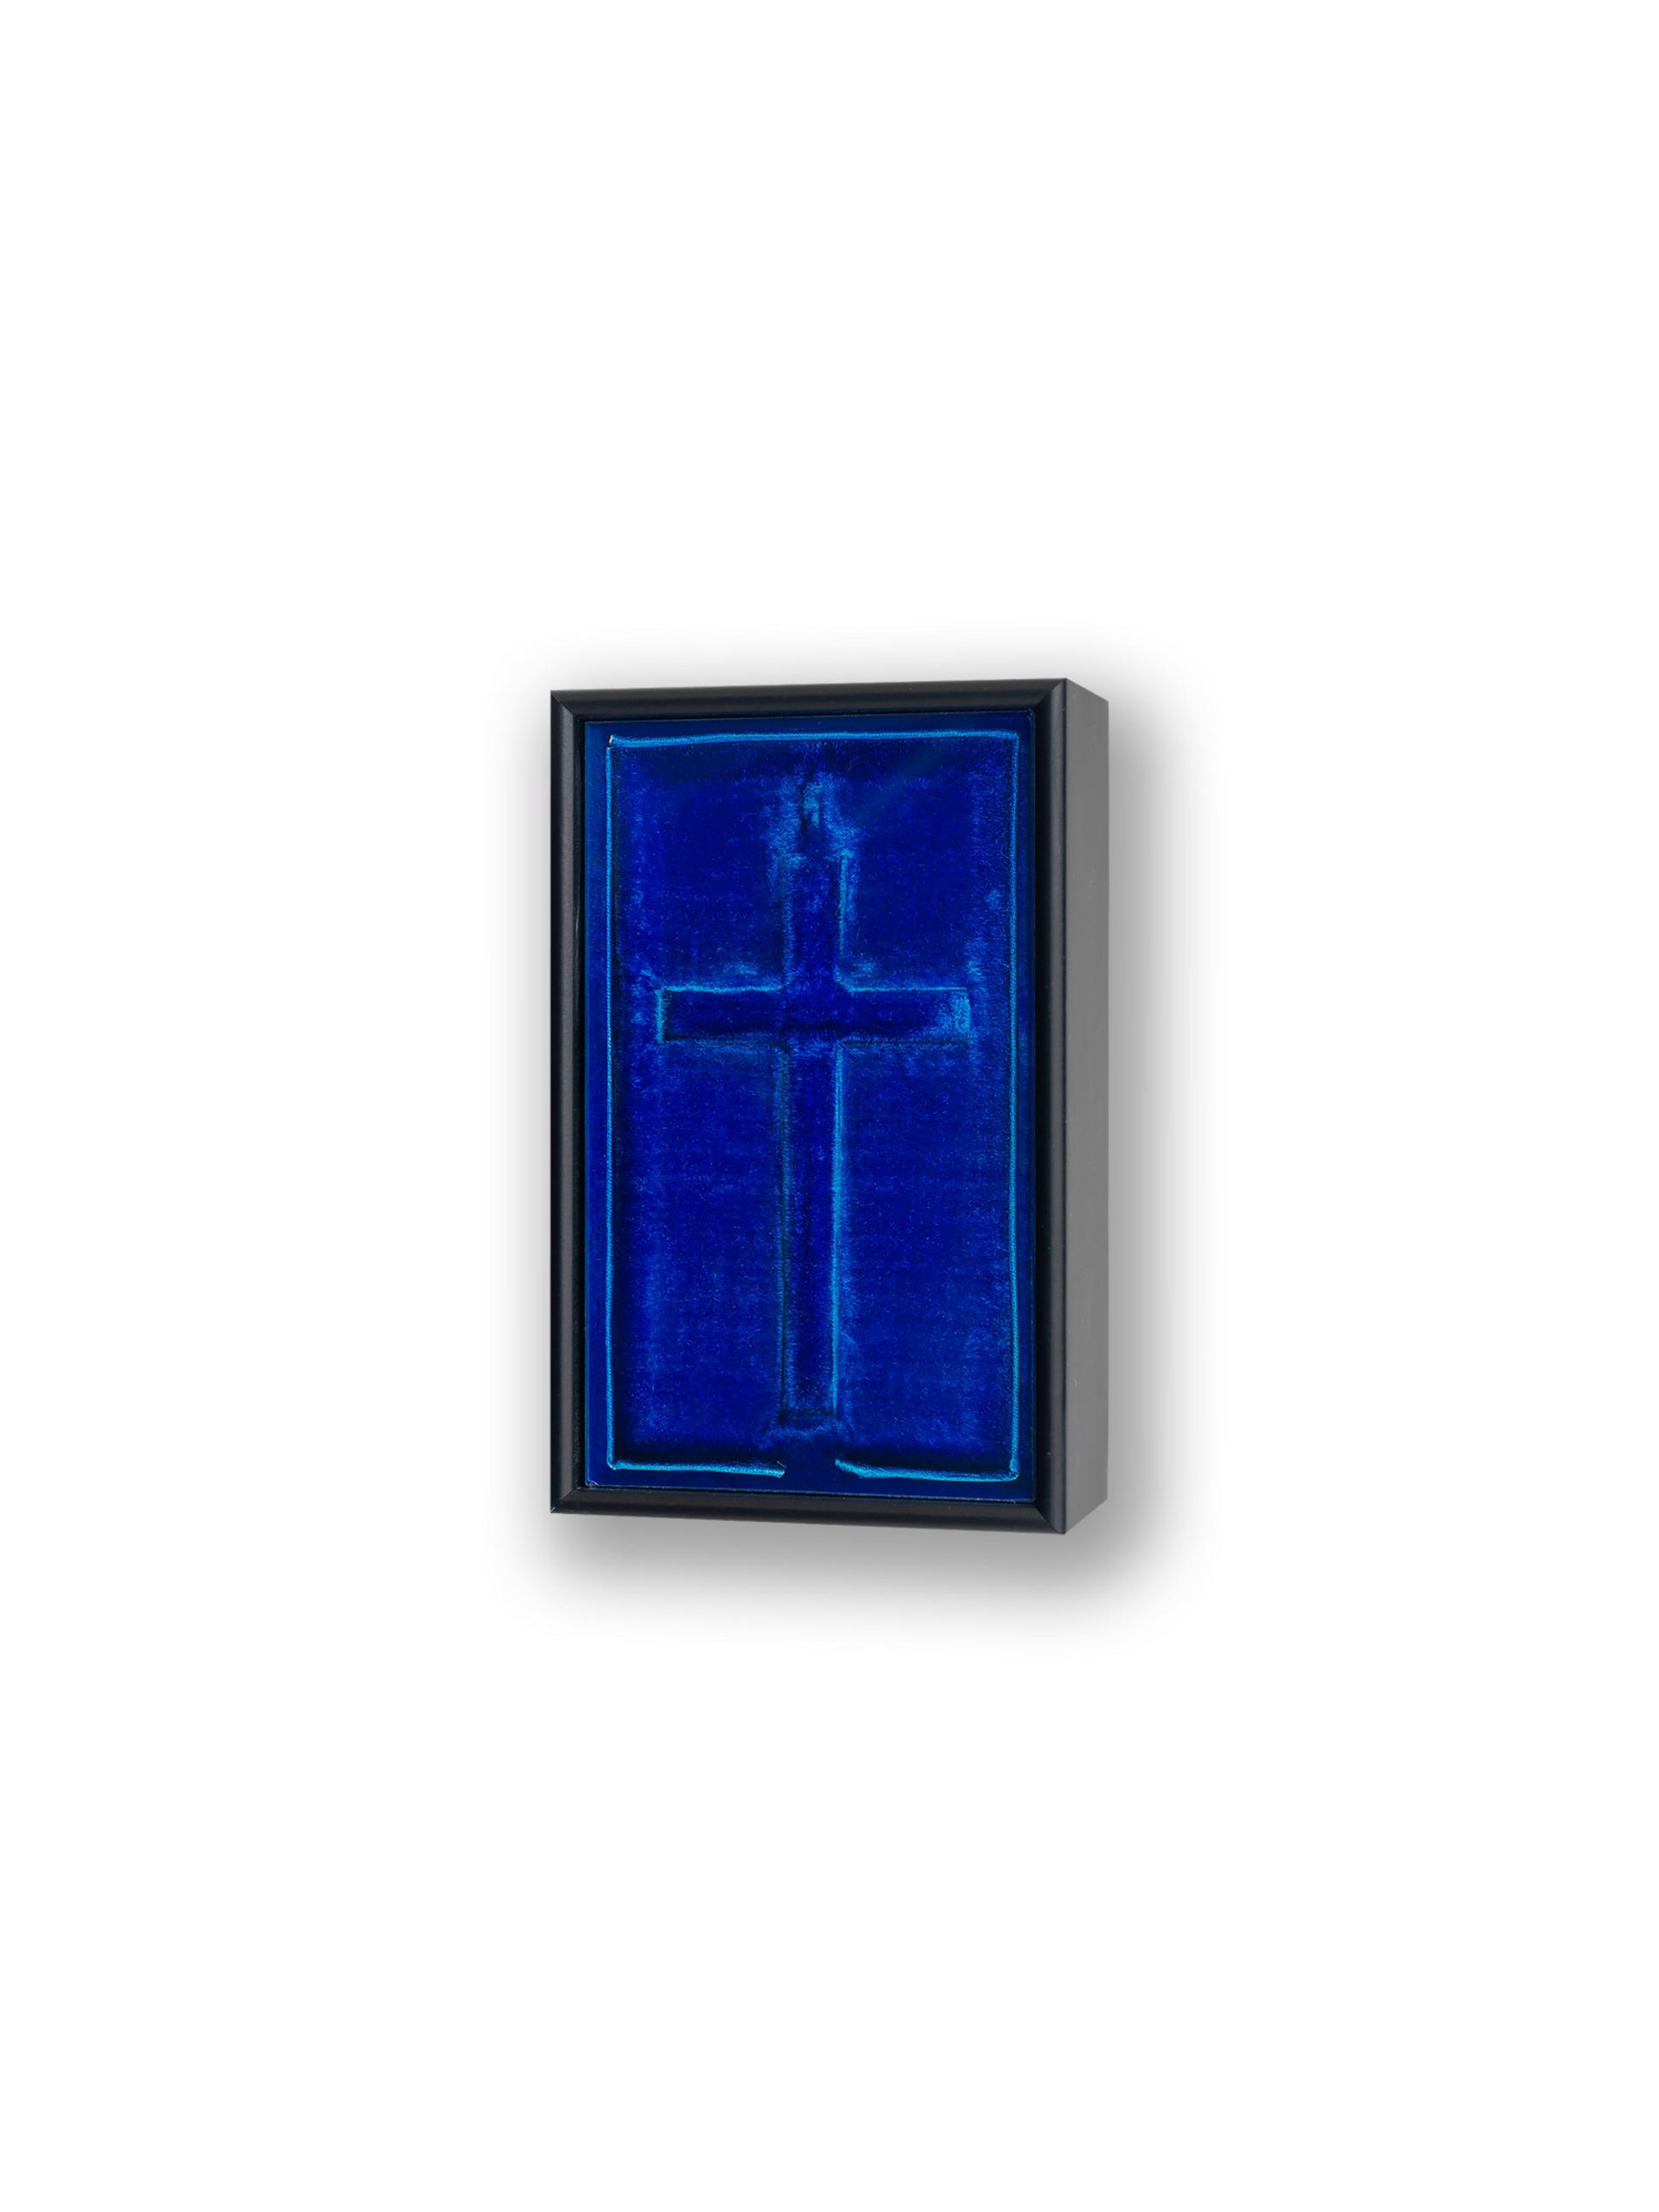 Vessel I, 2020 - 10 x 15cm (framed)